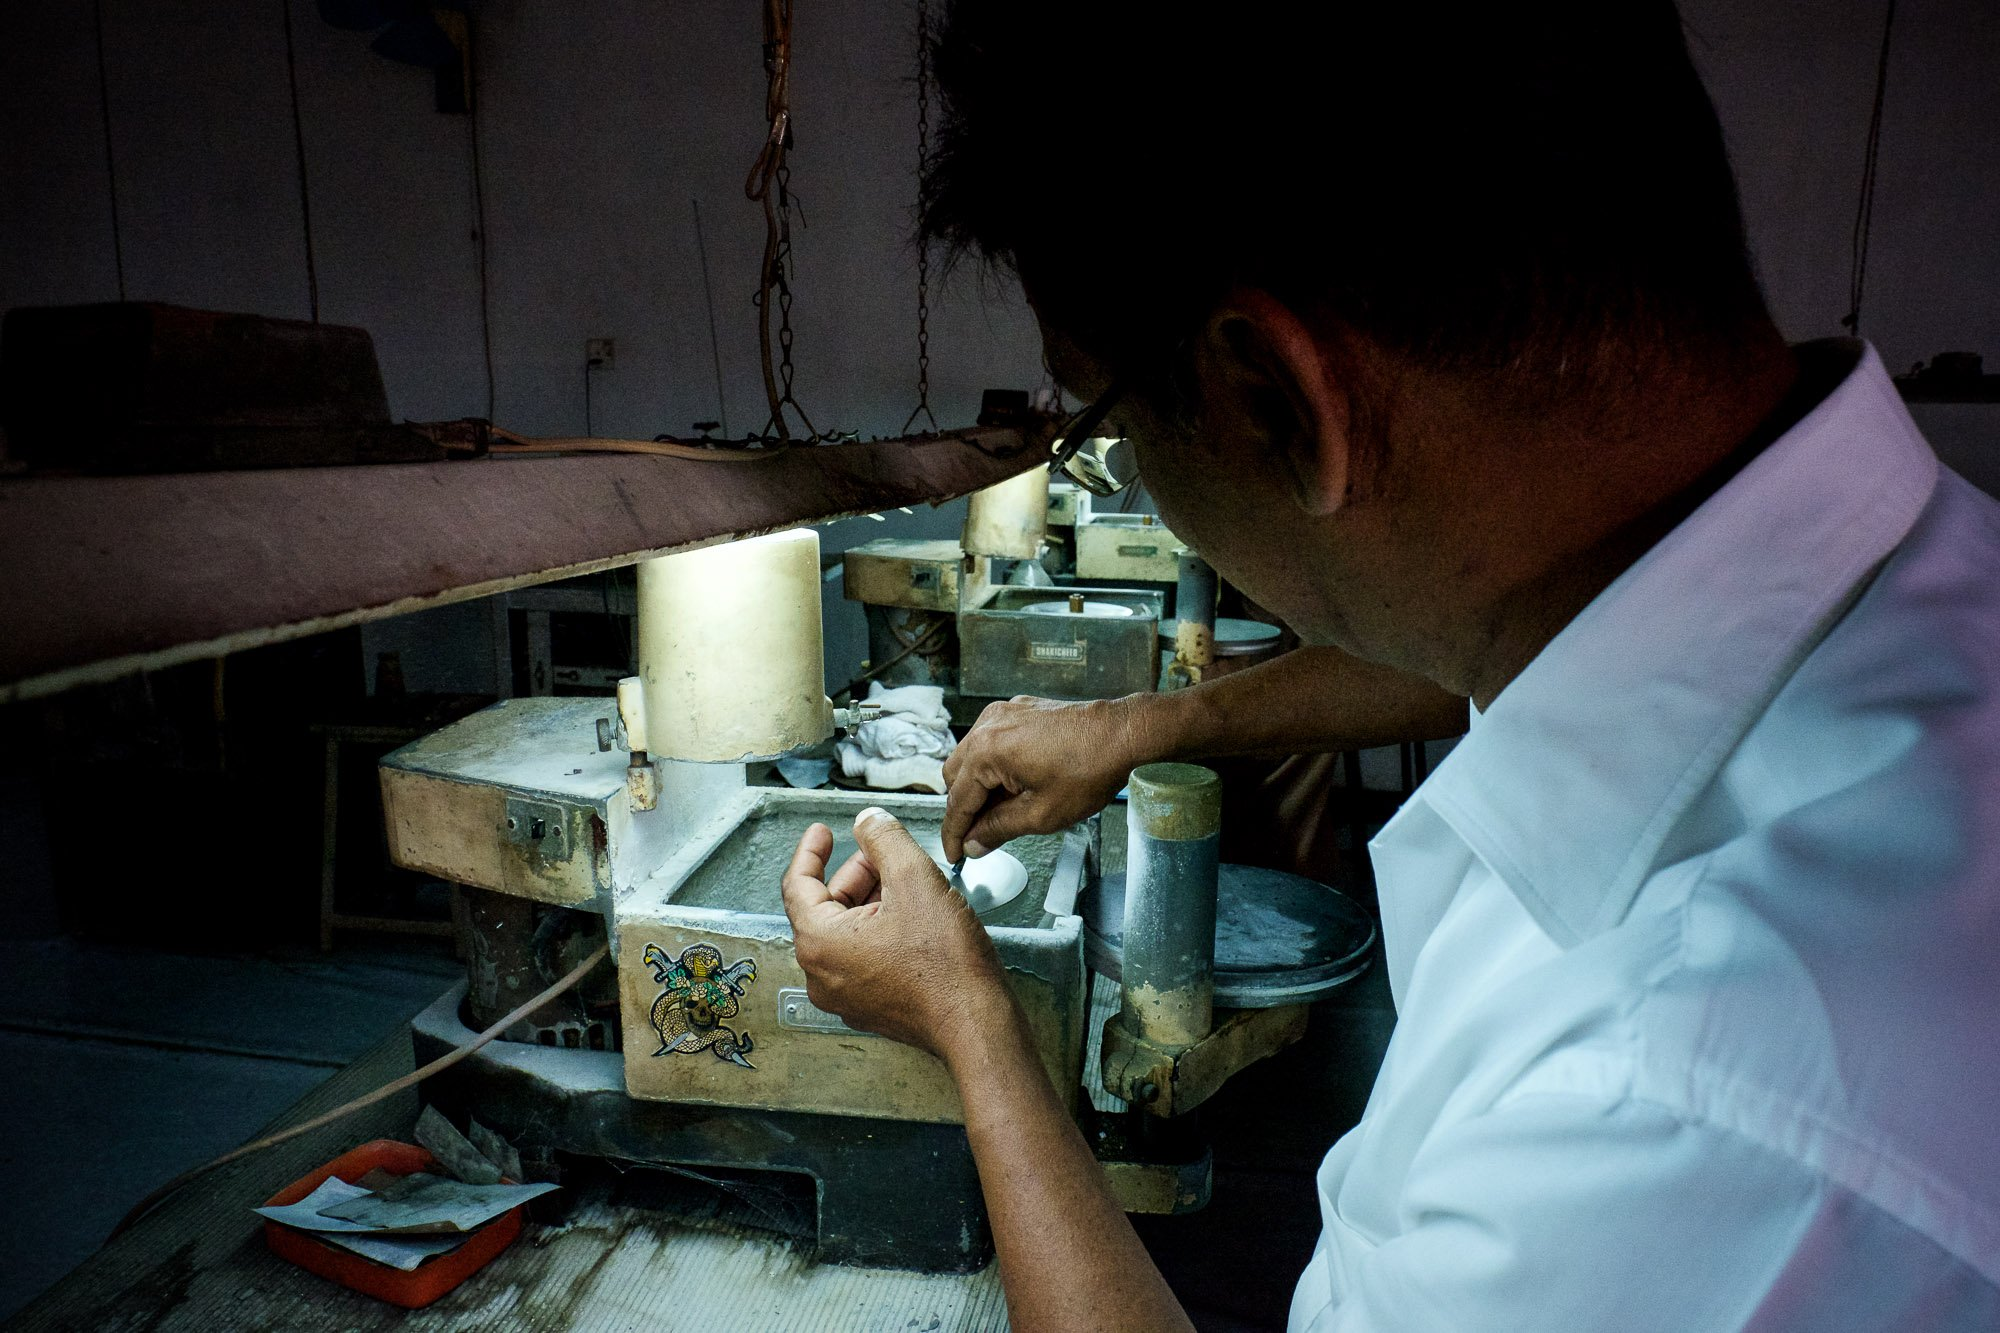 GEMS crafting Sapphire CRAFTING sri lanka ceylon Ruby stones jewelery polishing